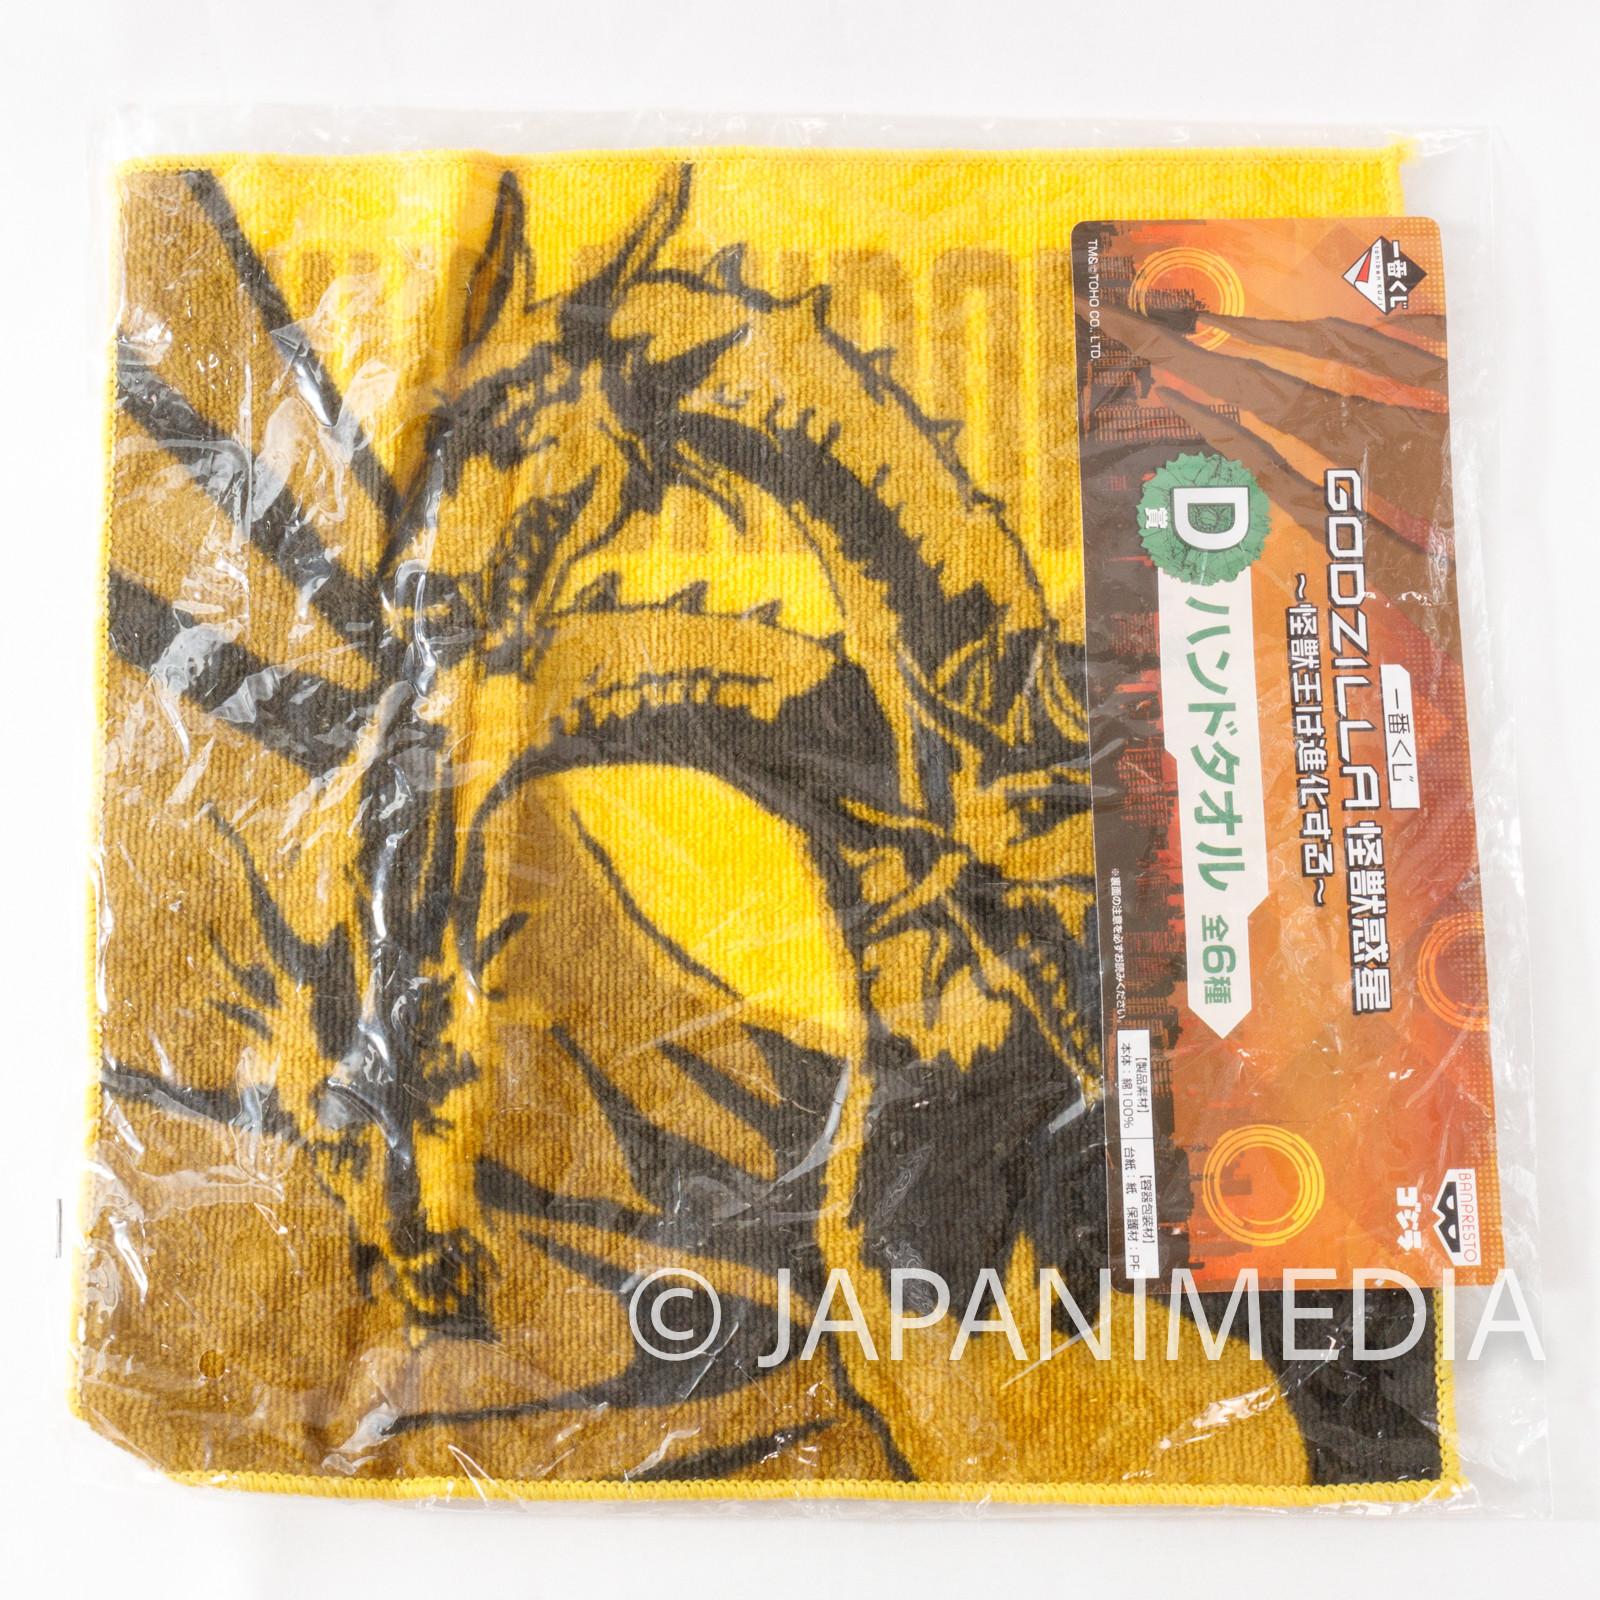 King Ghidorah Hand Towel 9.75x9.75 inch Godzilla Banpresto JAPAN TOKUSATSU